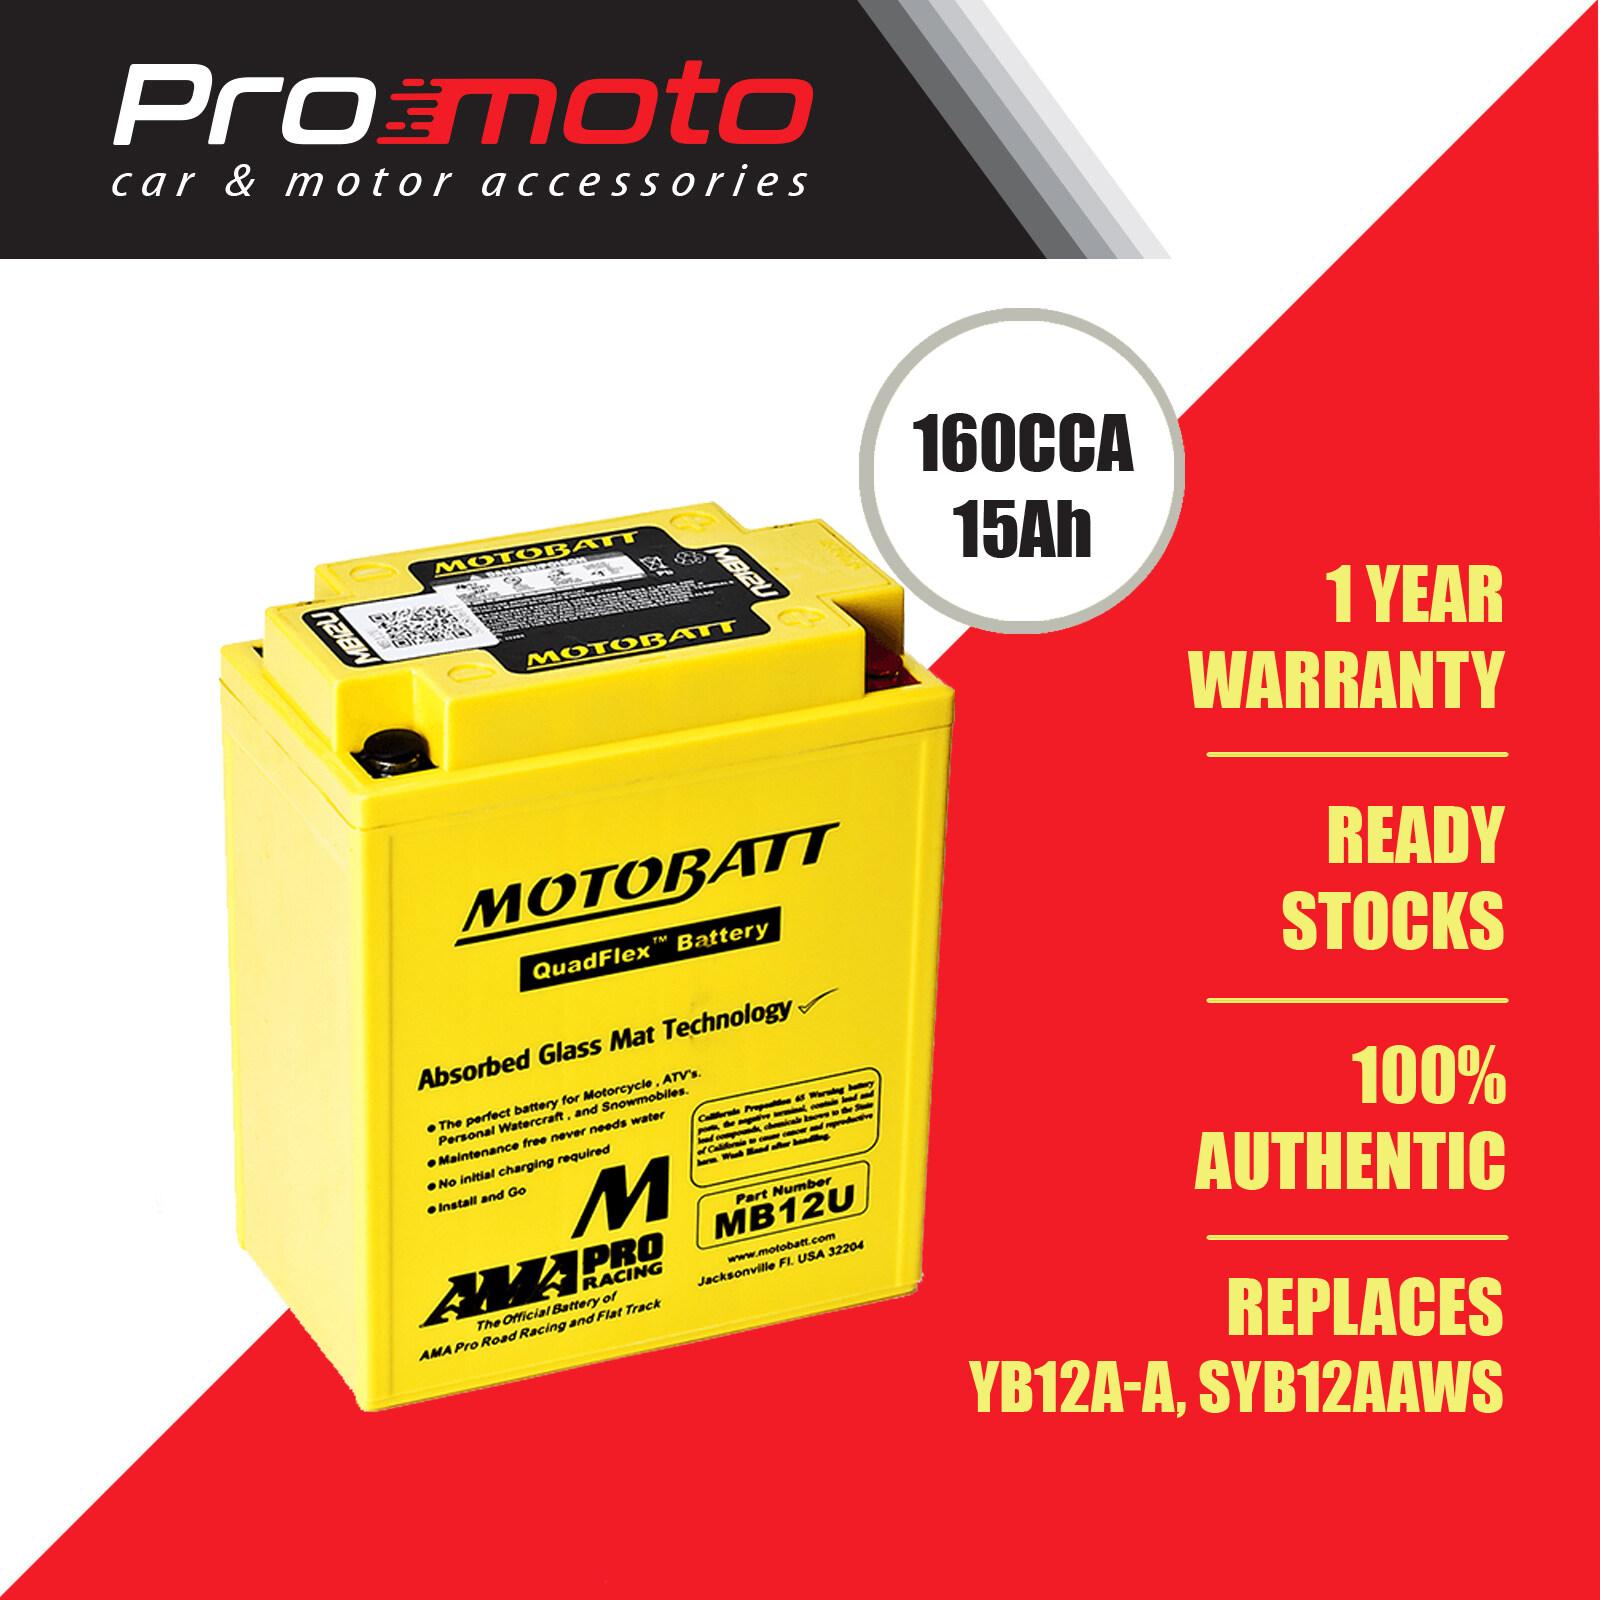 Motobatt Quadflex Battery MB12U (FOR HONDA, YAMAHA, DUCATI & etc) (Replaces YB12A-A, SYB12AAWS, YB12ALA)